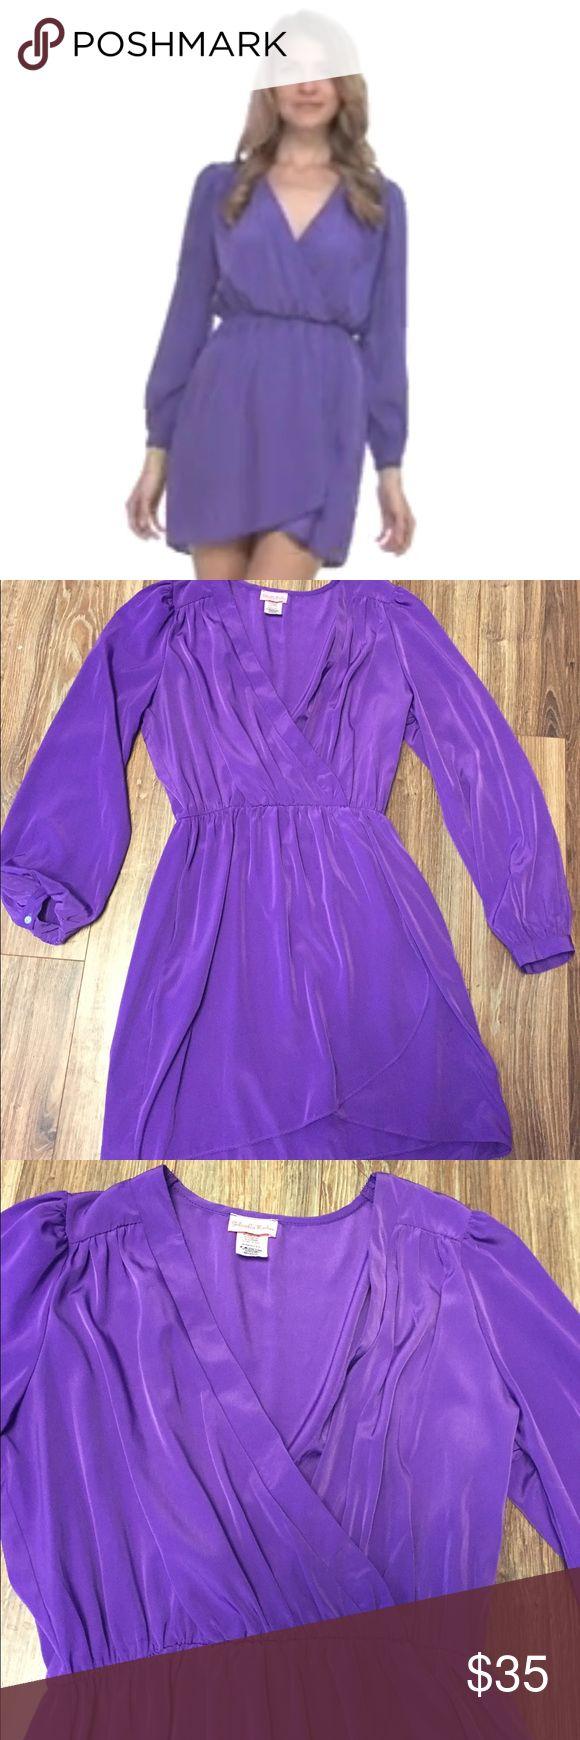 Gabriella Rocha Solinae Dress Size medium. Bright purple. Worn once. Surplice top and tulip hem bottom. Posh only and no trades Gabriella Rocha Dresses